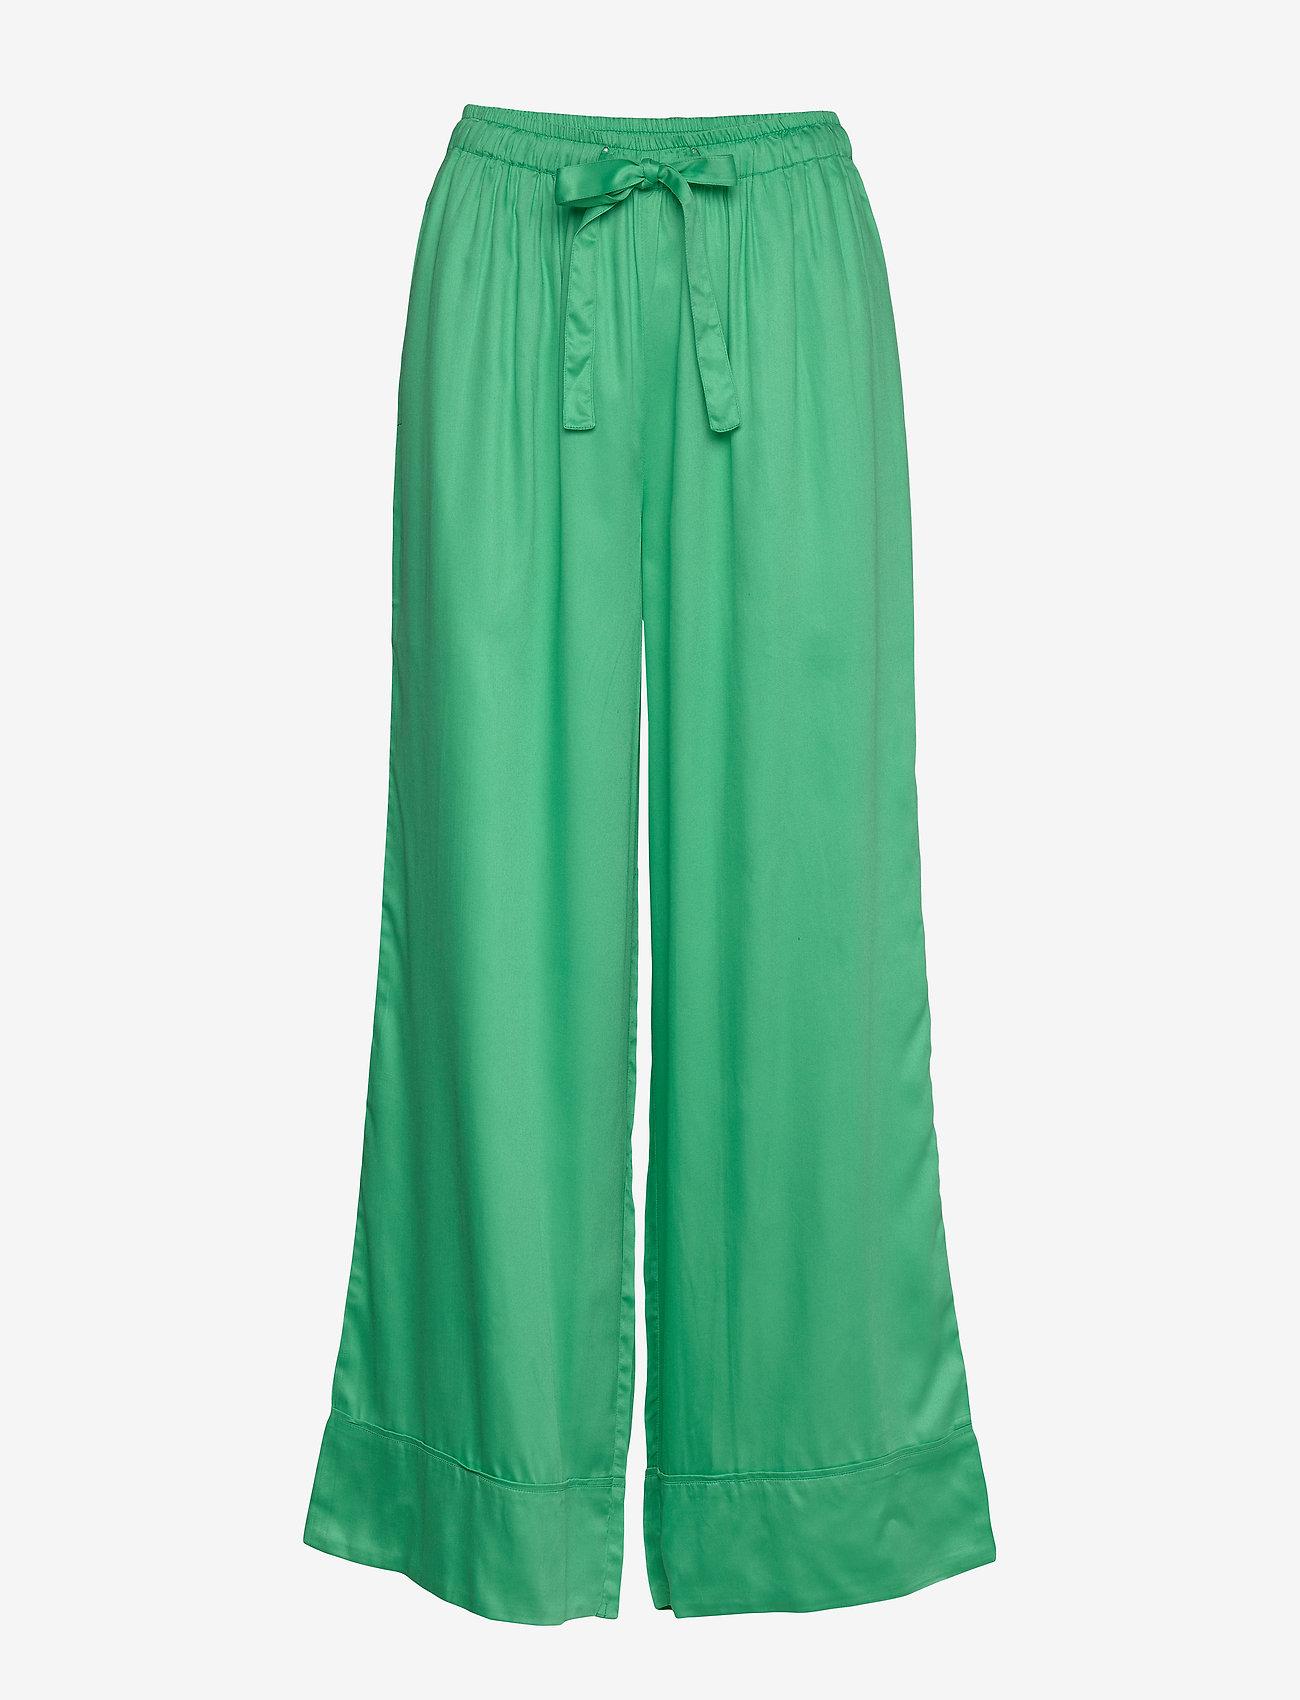 Underprotection - Rana pants - nederdelar - green - 0